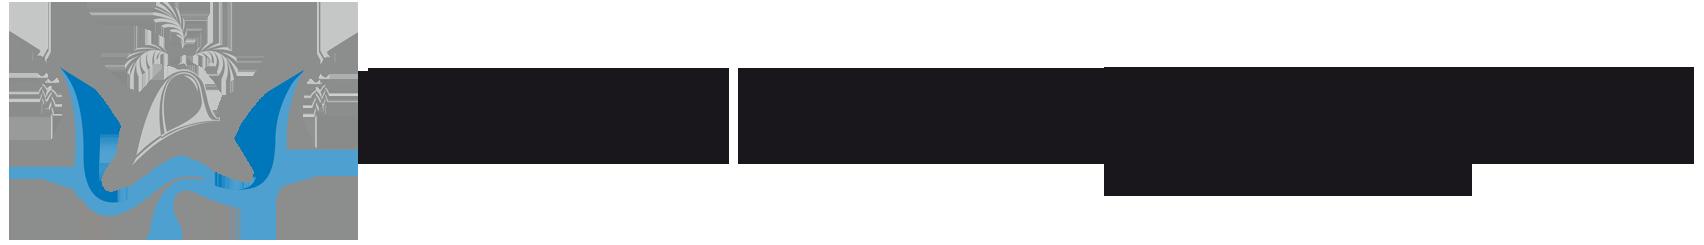 Domaine Michel Juillot - Mercurey